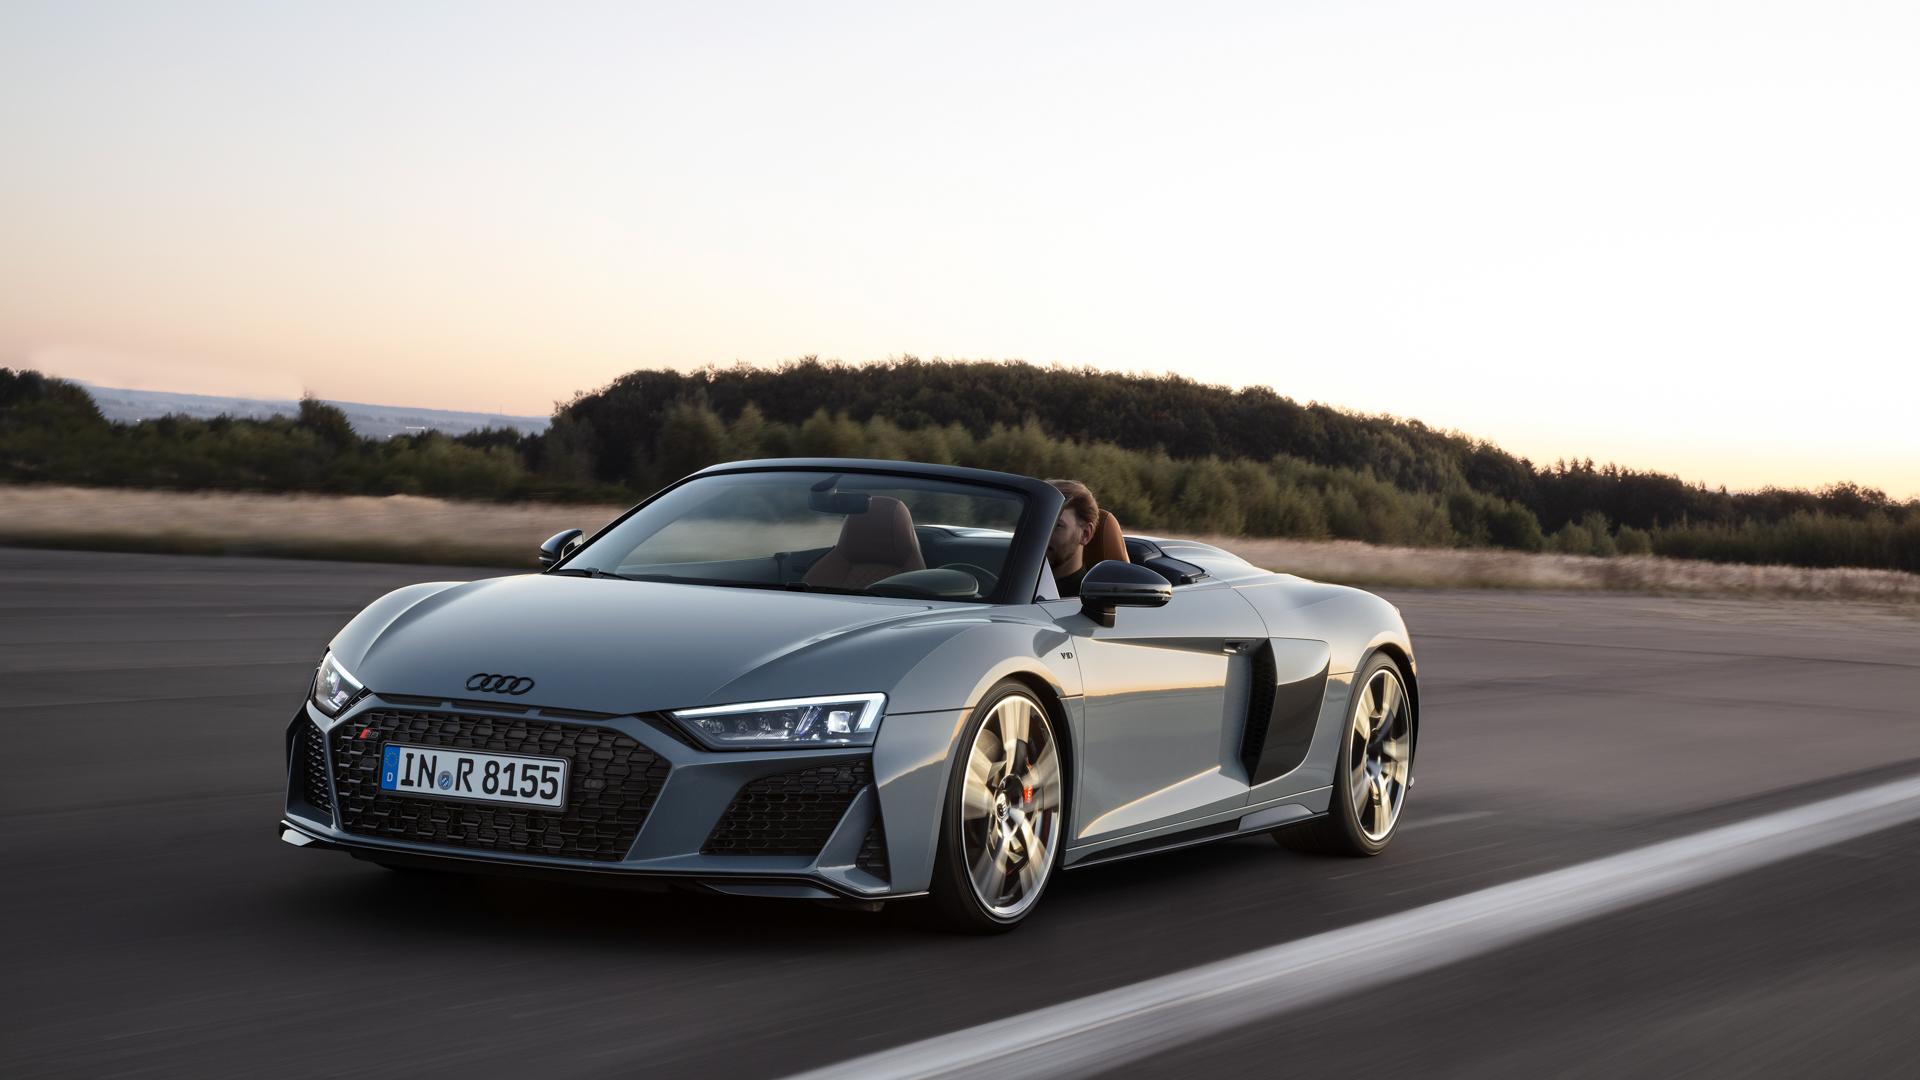 Kelebihan Kekurangan Audi M8 Review